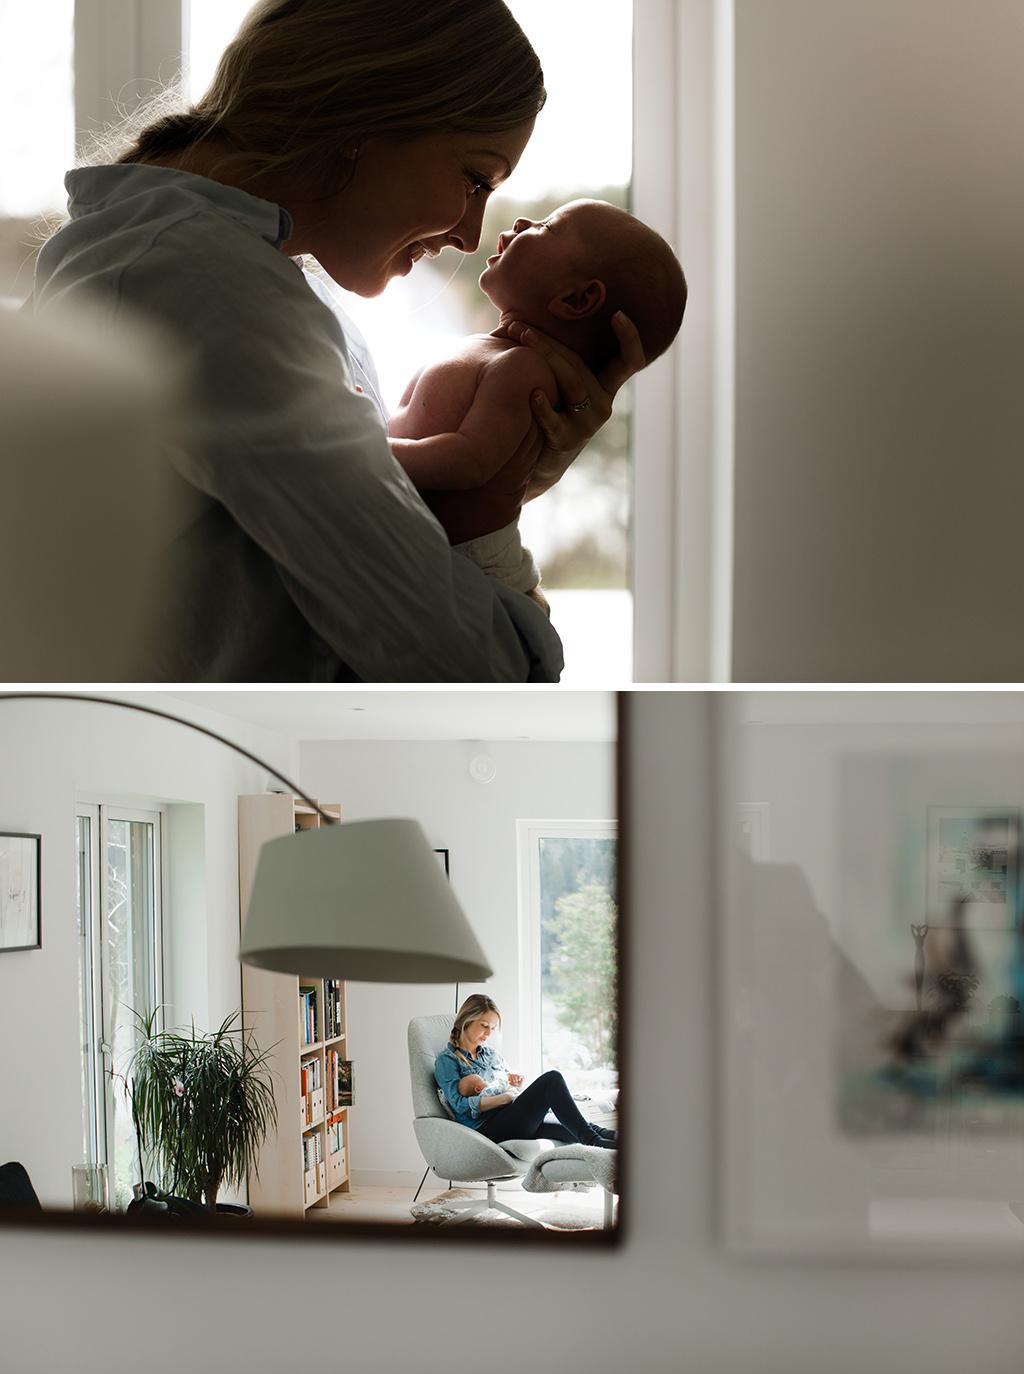 Nyfoddfotografering-i-Stockholm_familjefotograf_Anna-Sandstrom_2.jpg